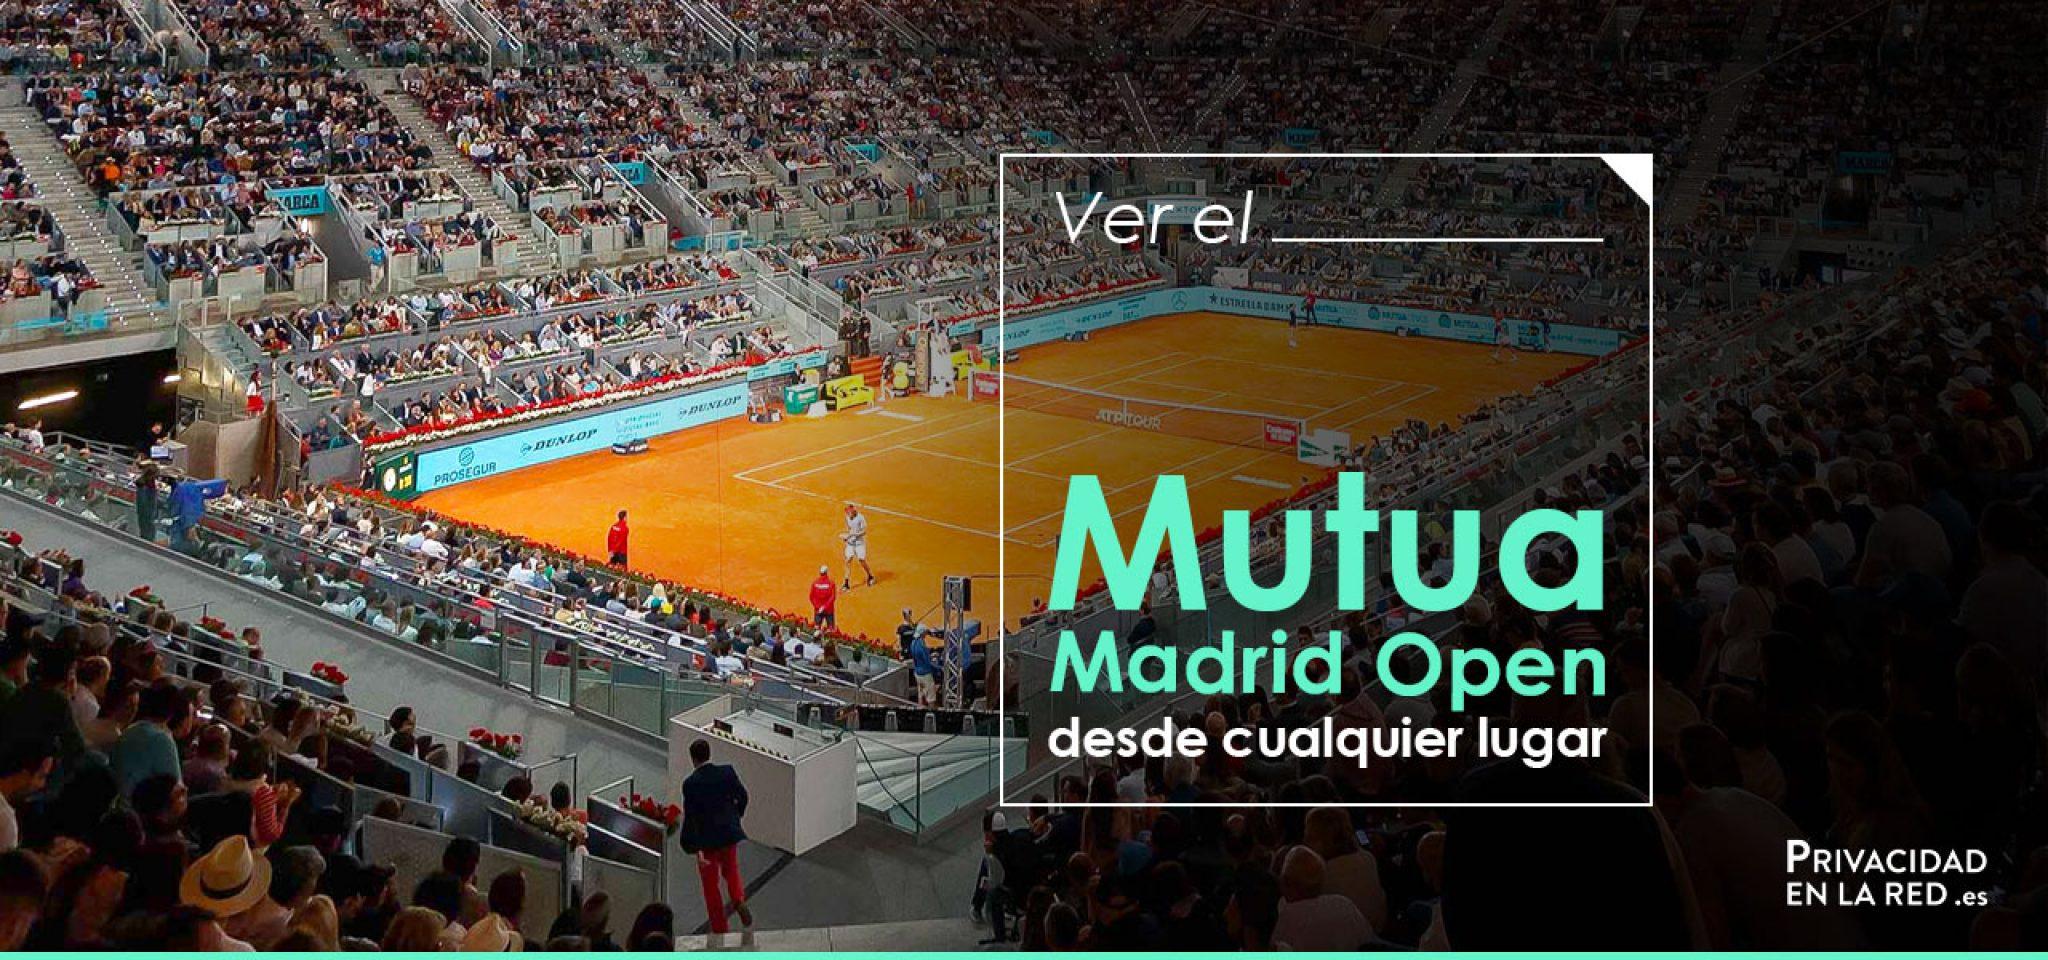 Mutua Madrid Open 2021